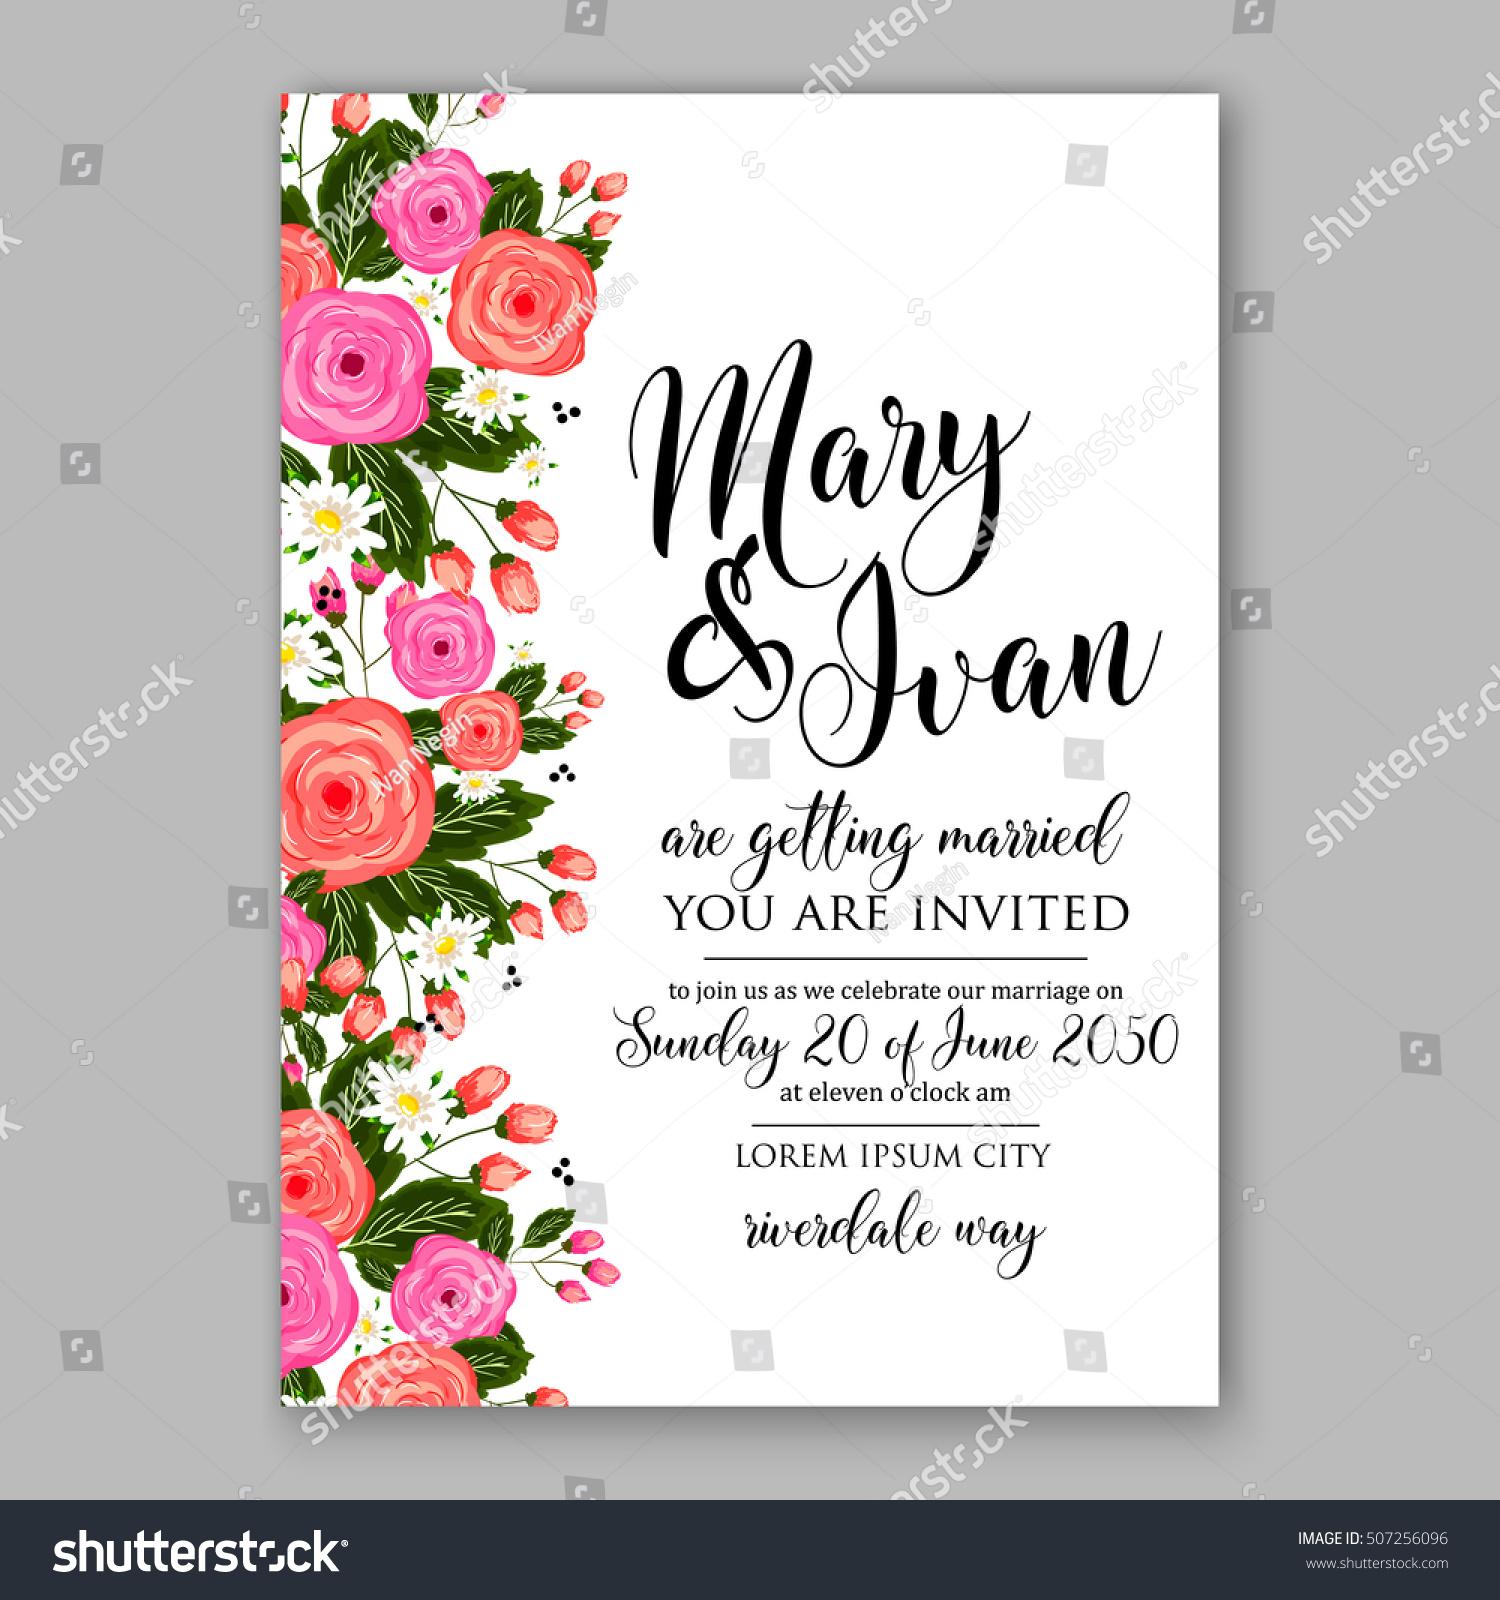 Wedding Invitation Printable Template Floral Wreath Stock Vector ...